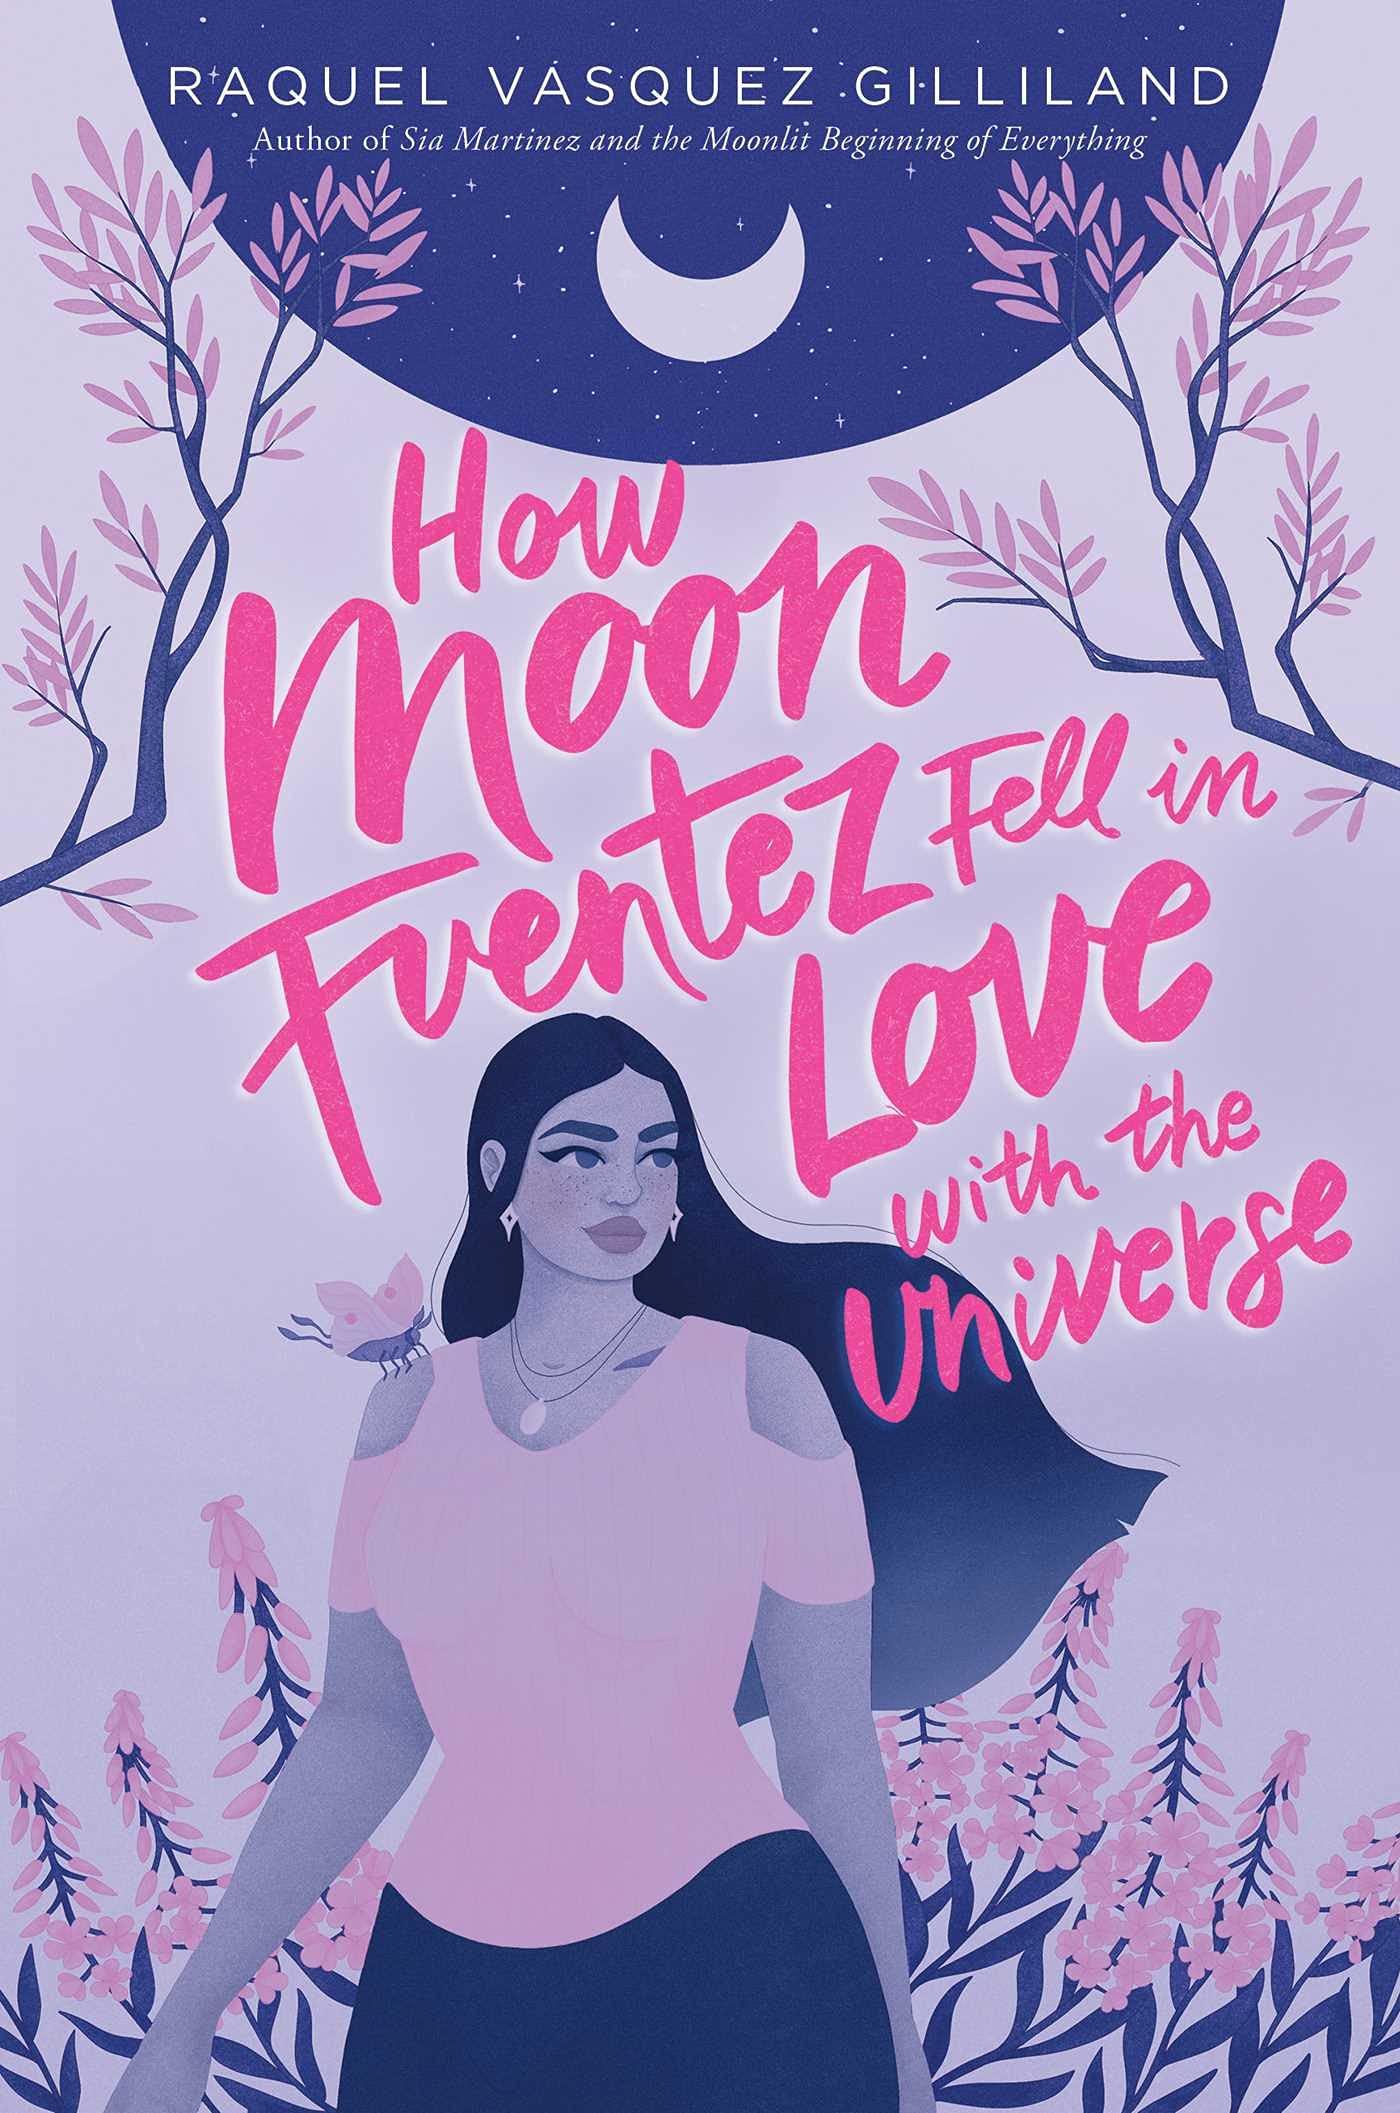 How Moon Fuentez Fell in Love with the Universe : Gilliland, Raquel  Vasquez: Amazon.ca: Books